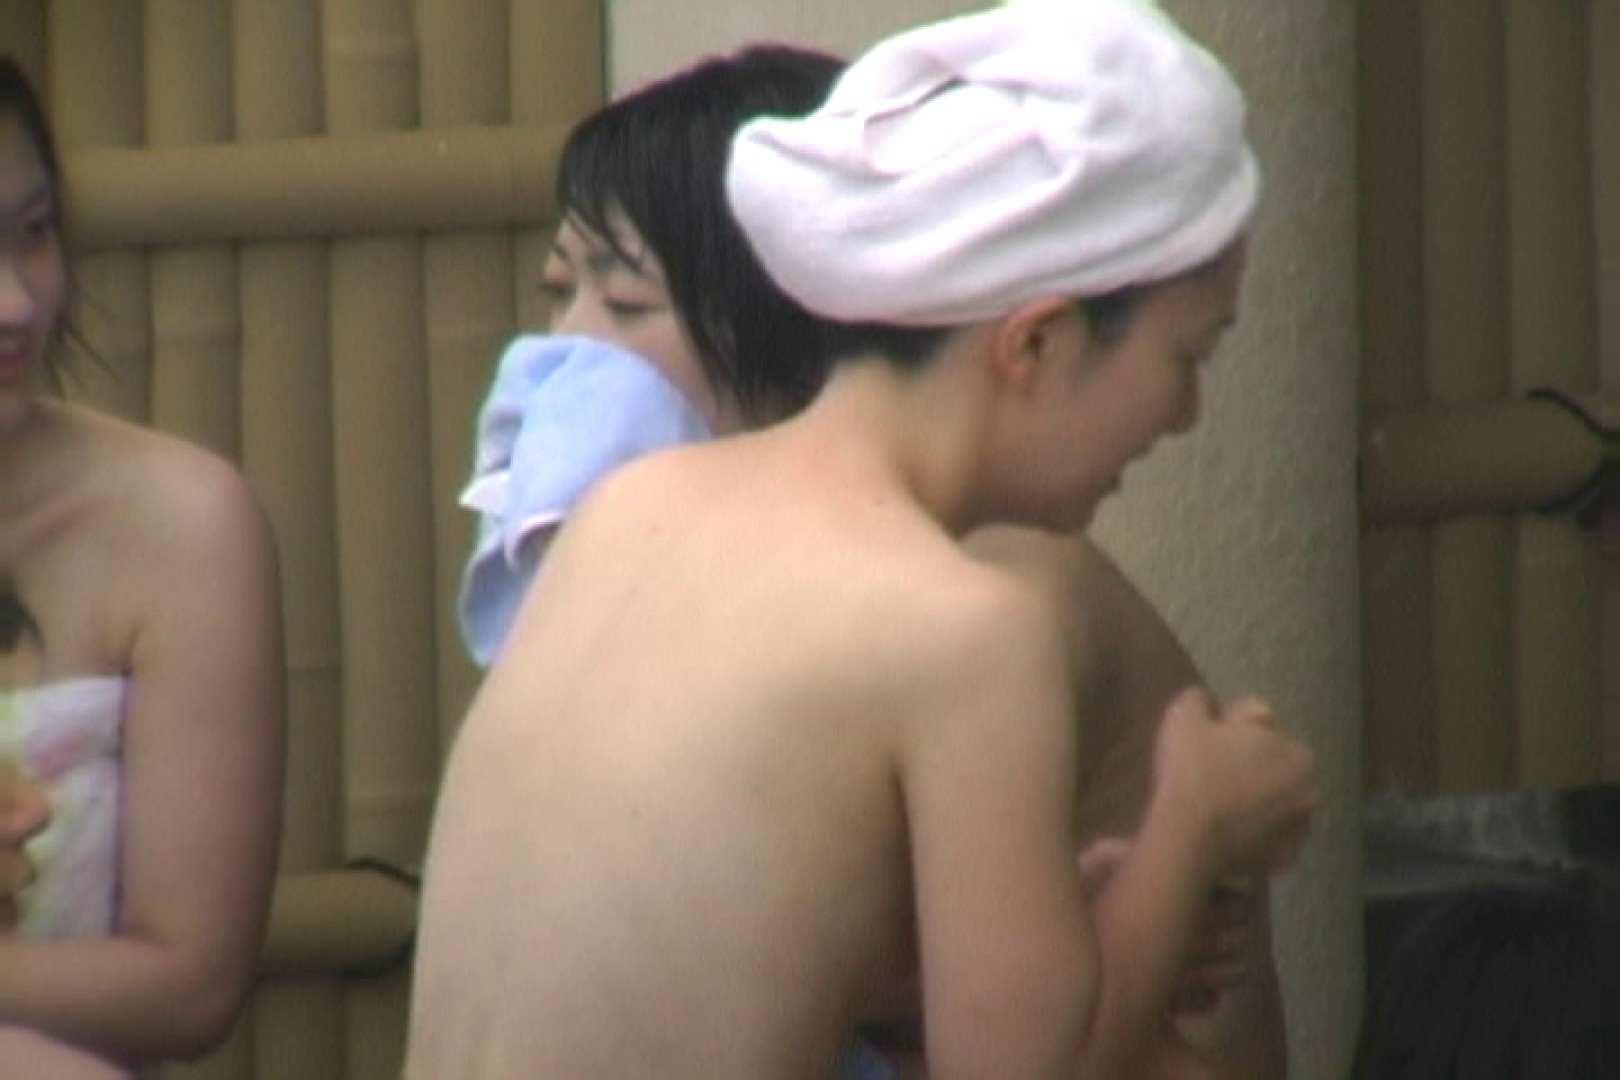 Aquaな露天風呂Vol.11【VIP】 盗撮シリーズ | 露天風呂編  112PIX 37